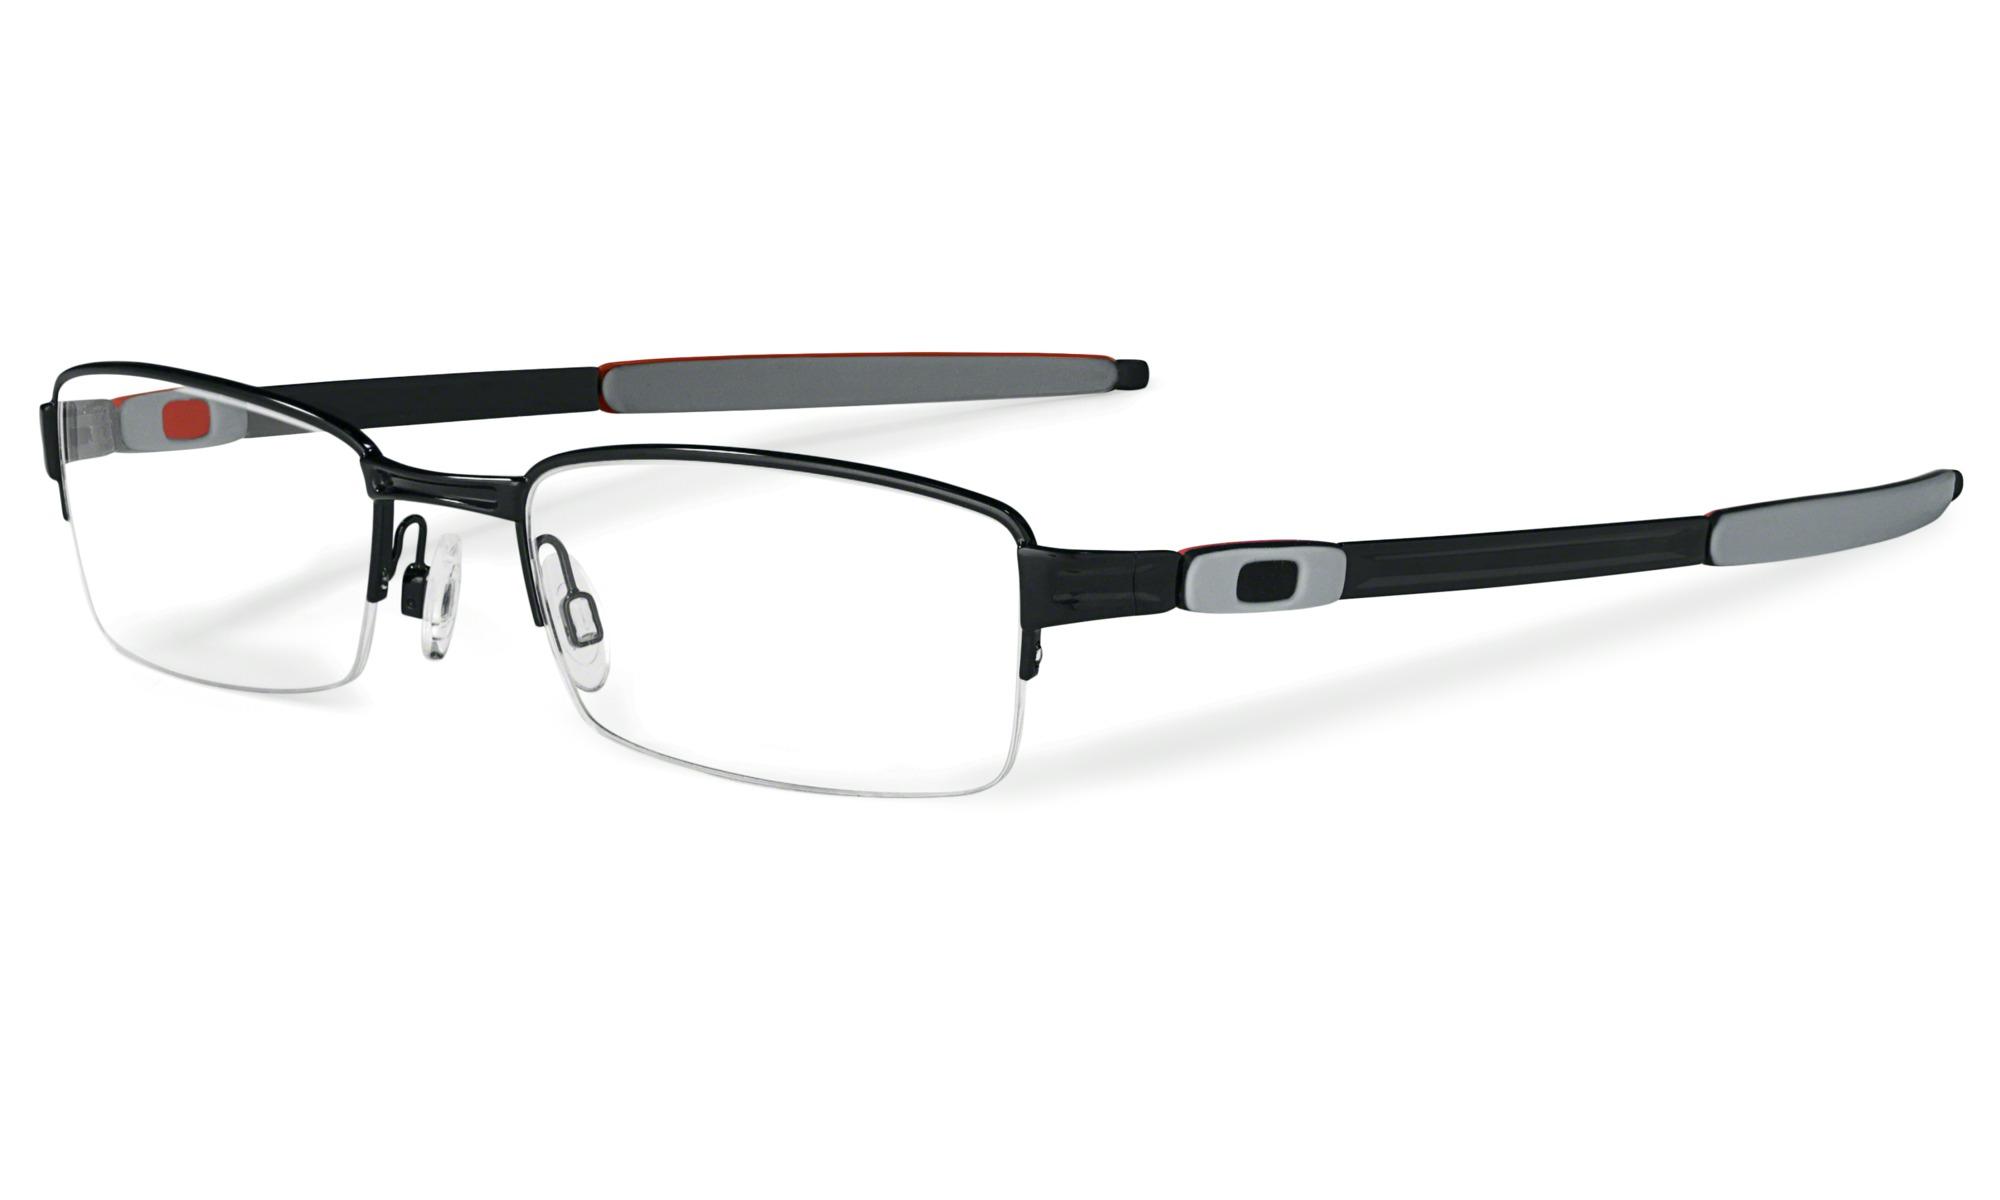 506068ece8fd0 Oakley Tumbleweed Progressive Rx Eyeglasses